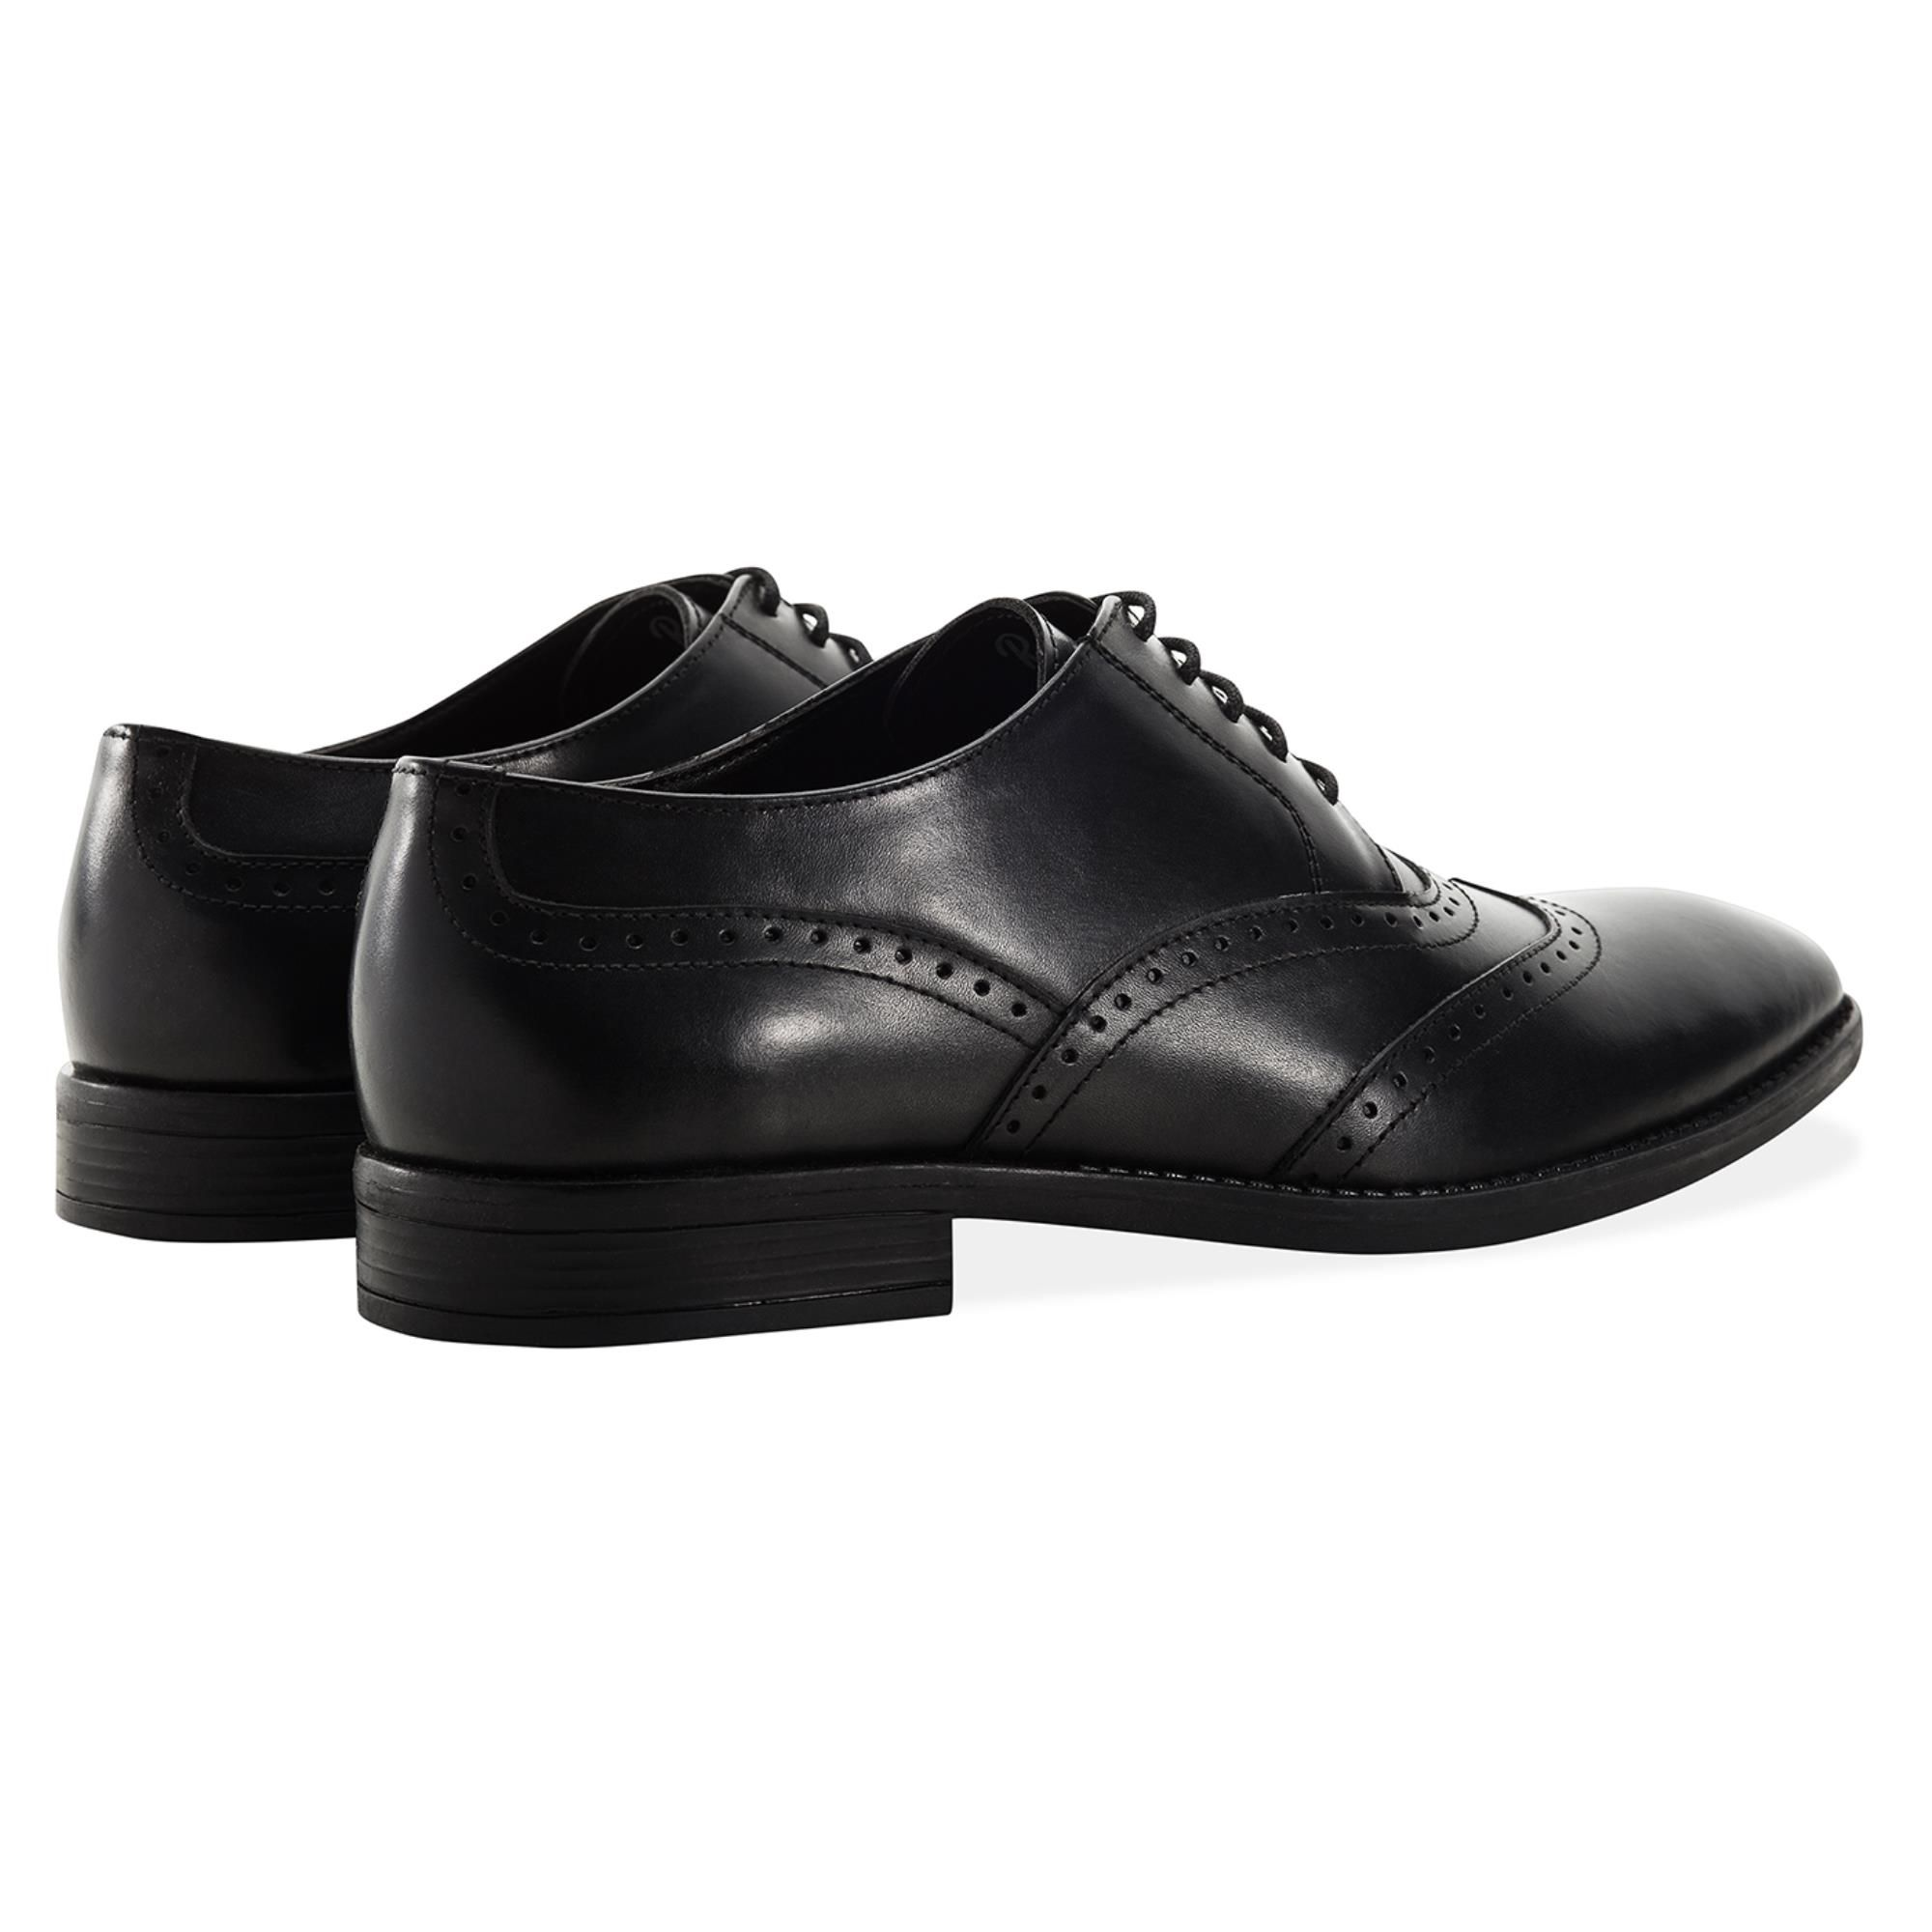 Redfoot Arthur Black Leather Derby Shoe